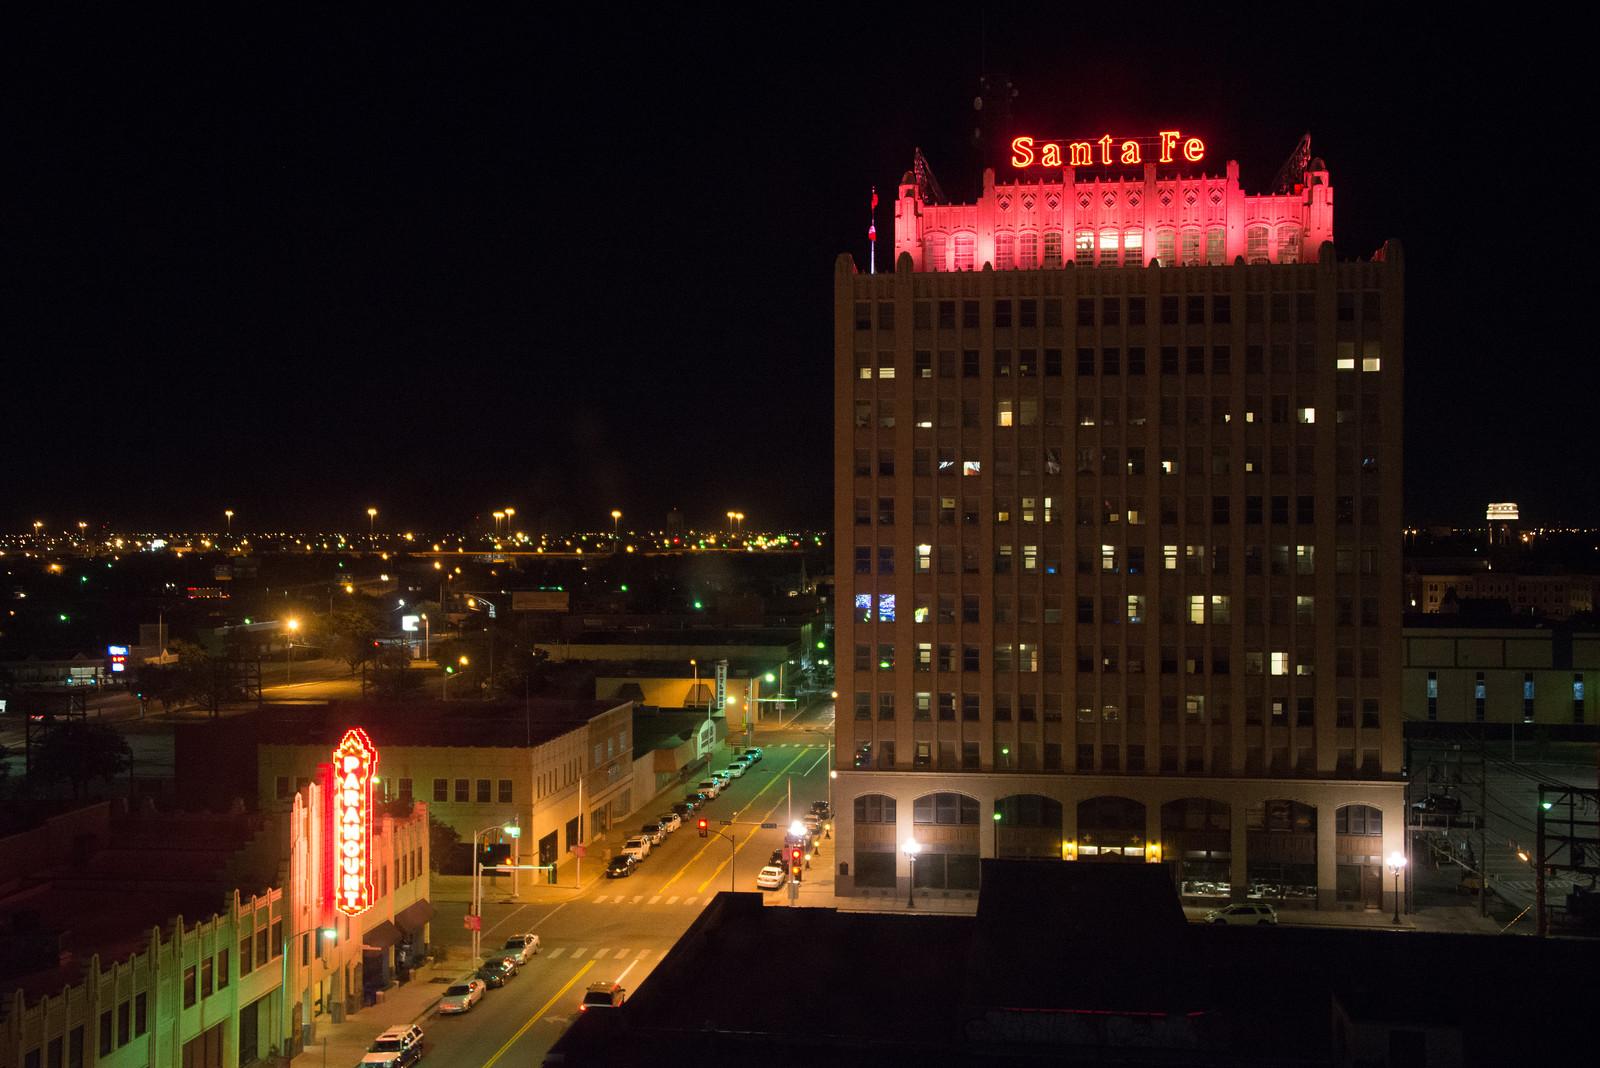 Amarillo, Texas – Planeta.com